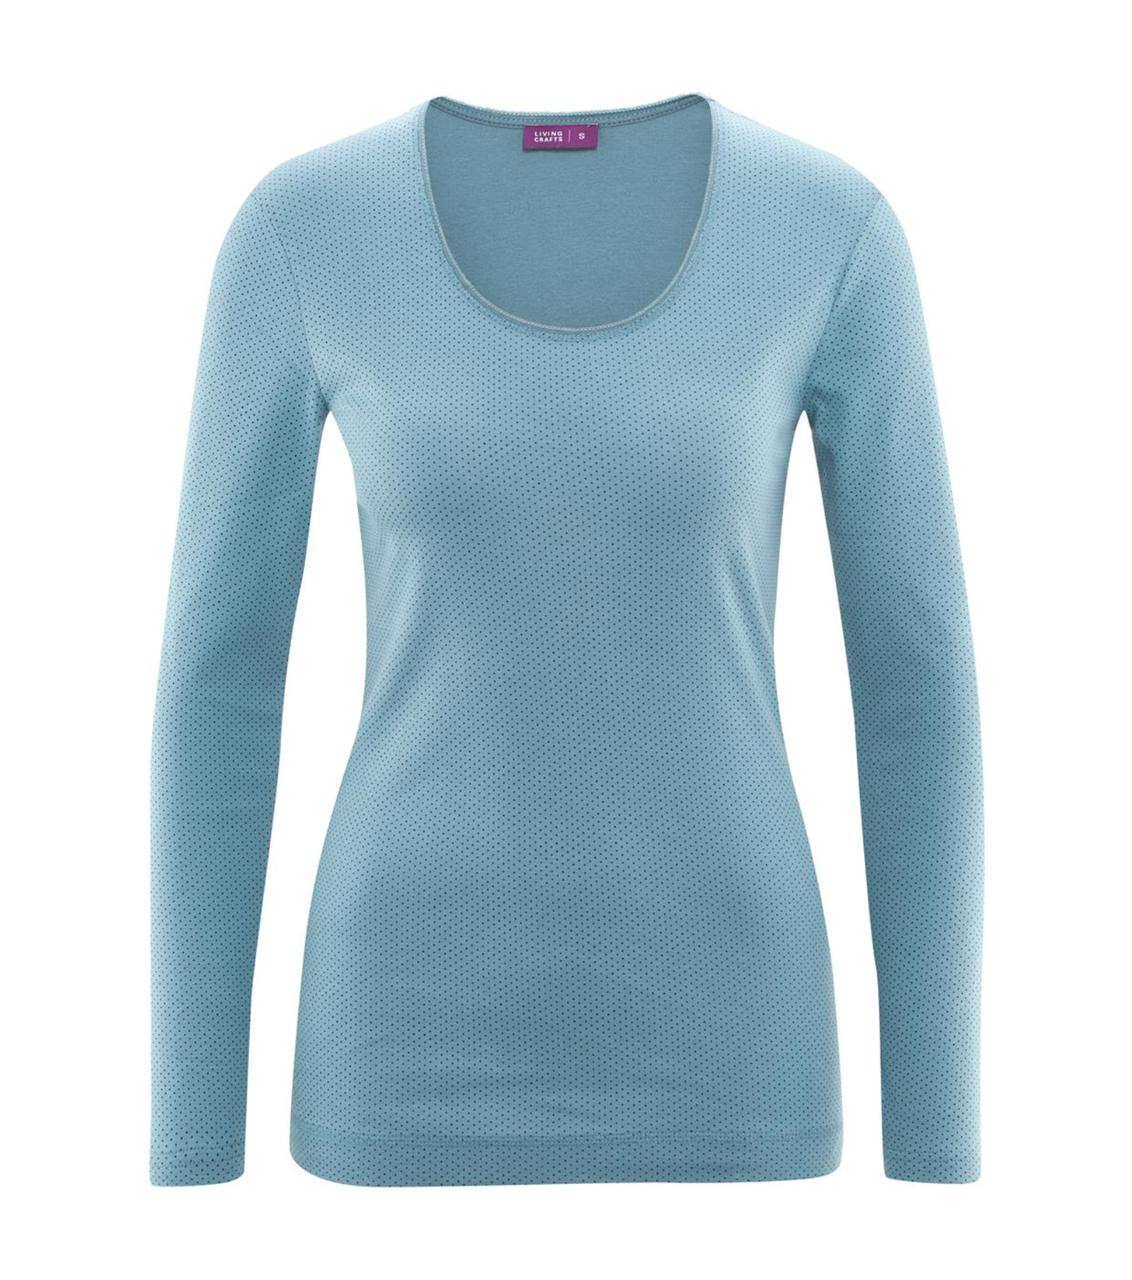 443d1598f3 Organic cotton Sleep Shirt Color  Cloud Dots